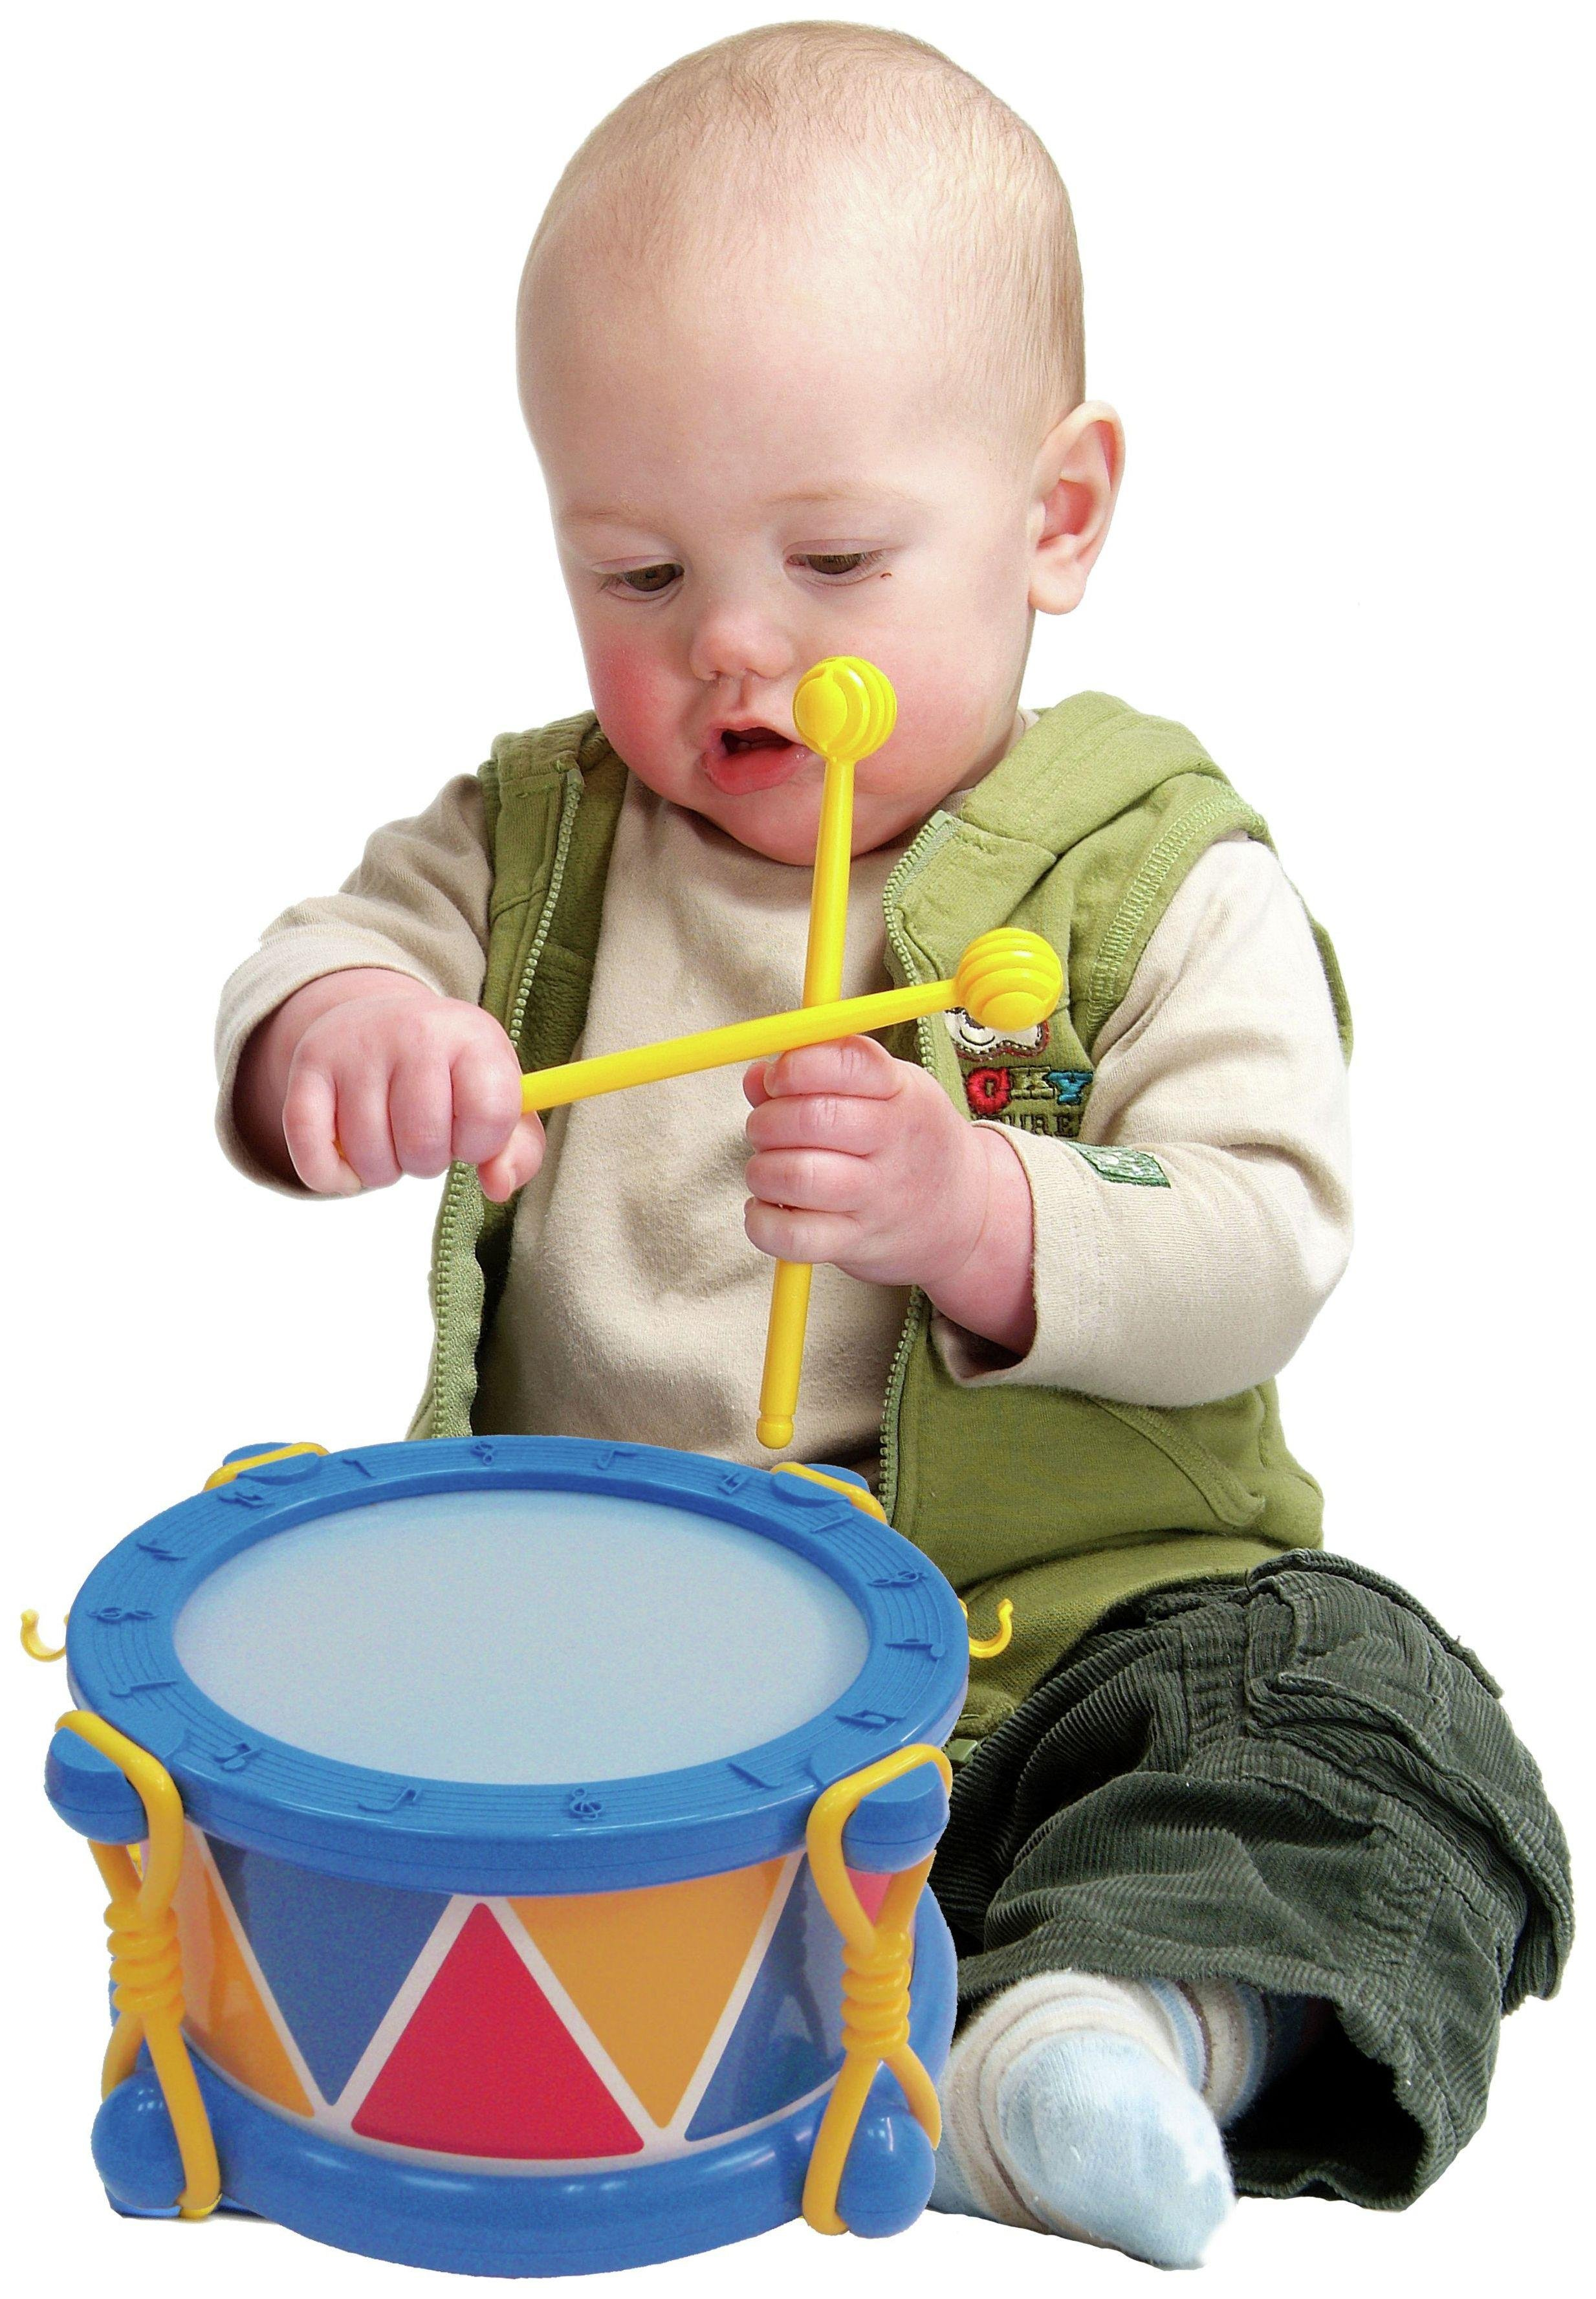 Image of Halilit - Baby Drum